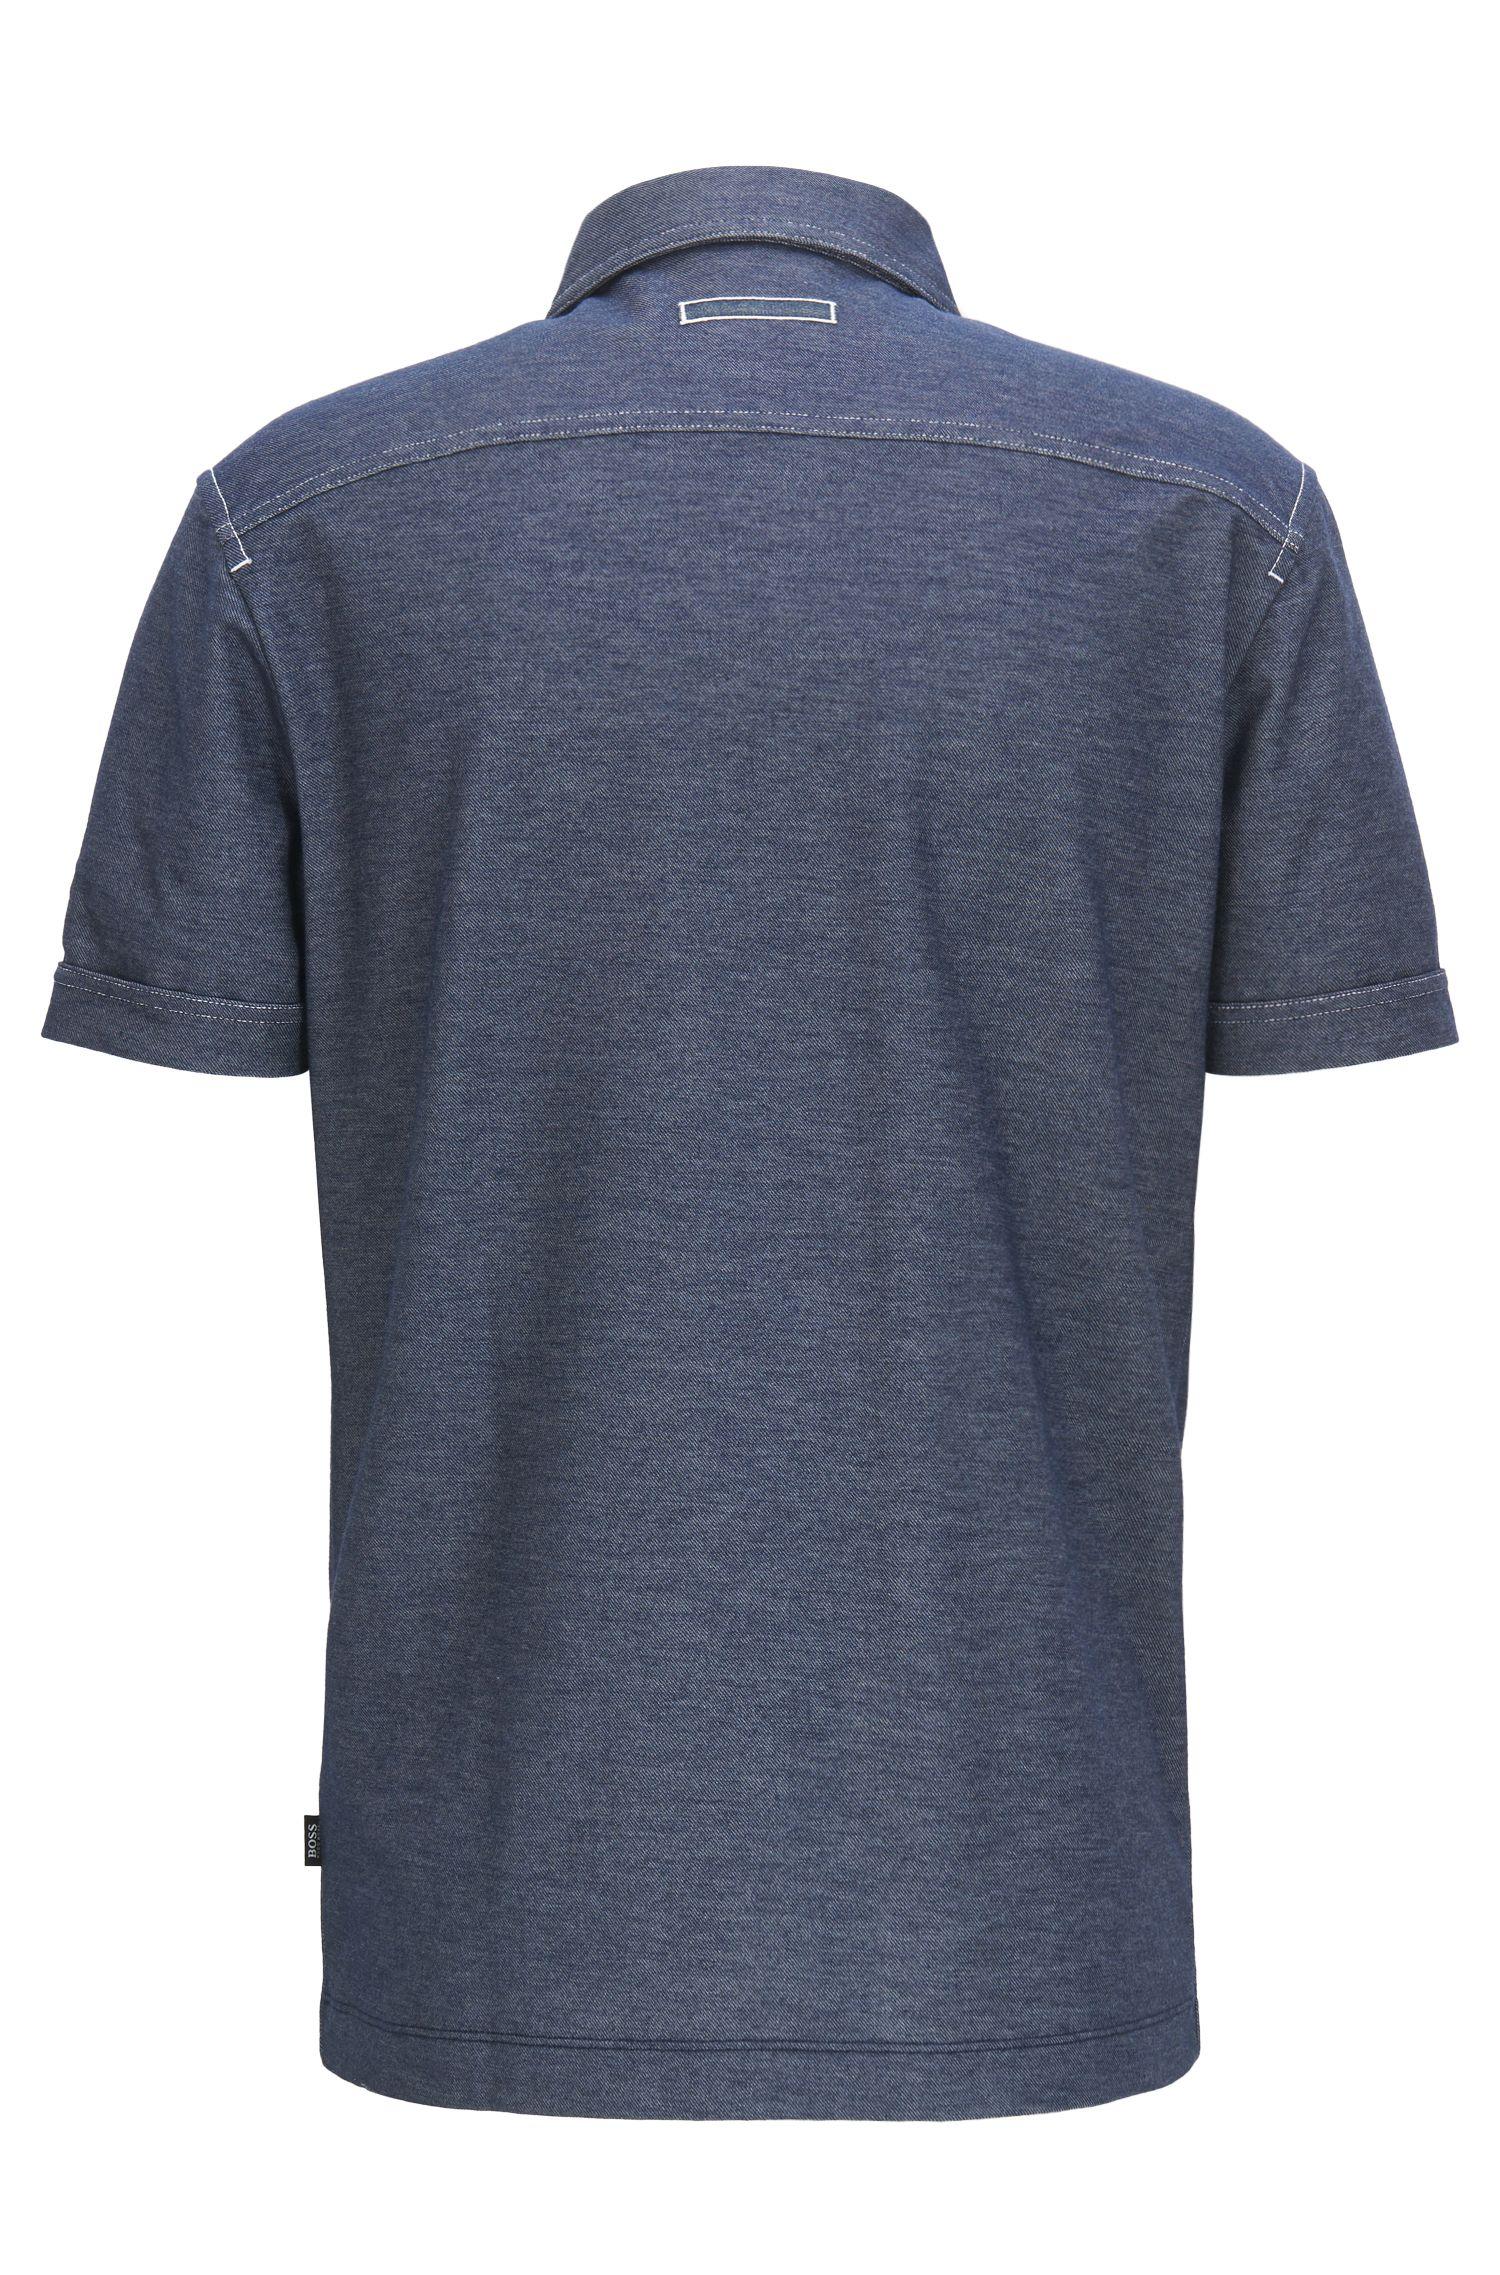 Cotton Blend, Regular Fit | Press, Dark Blue